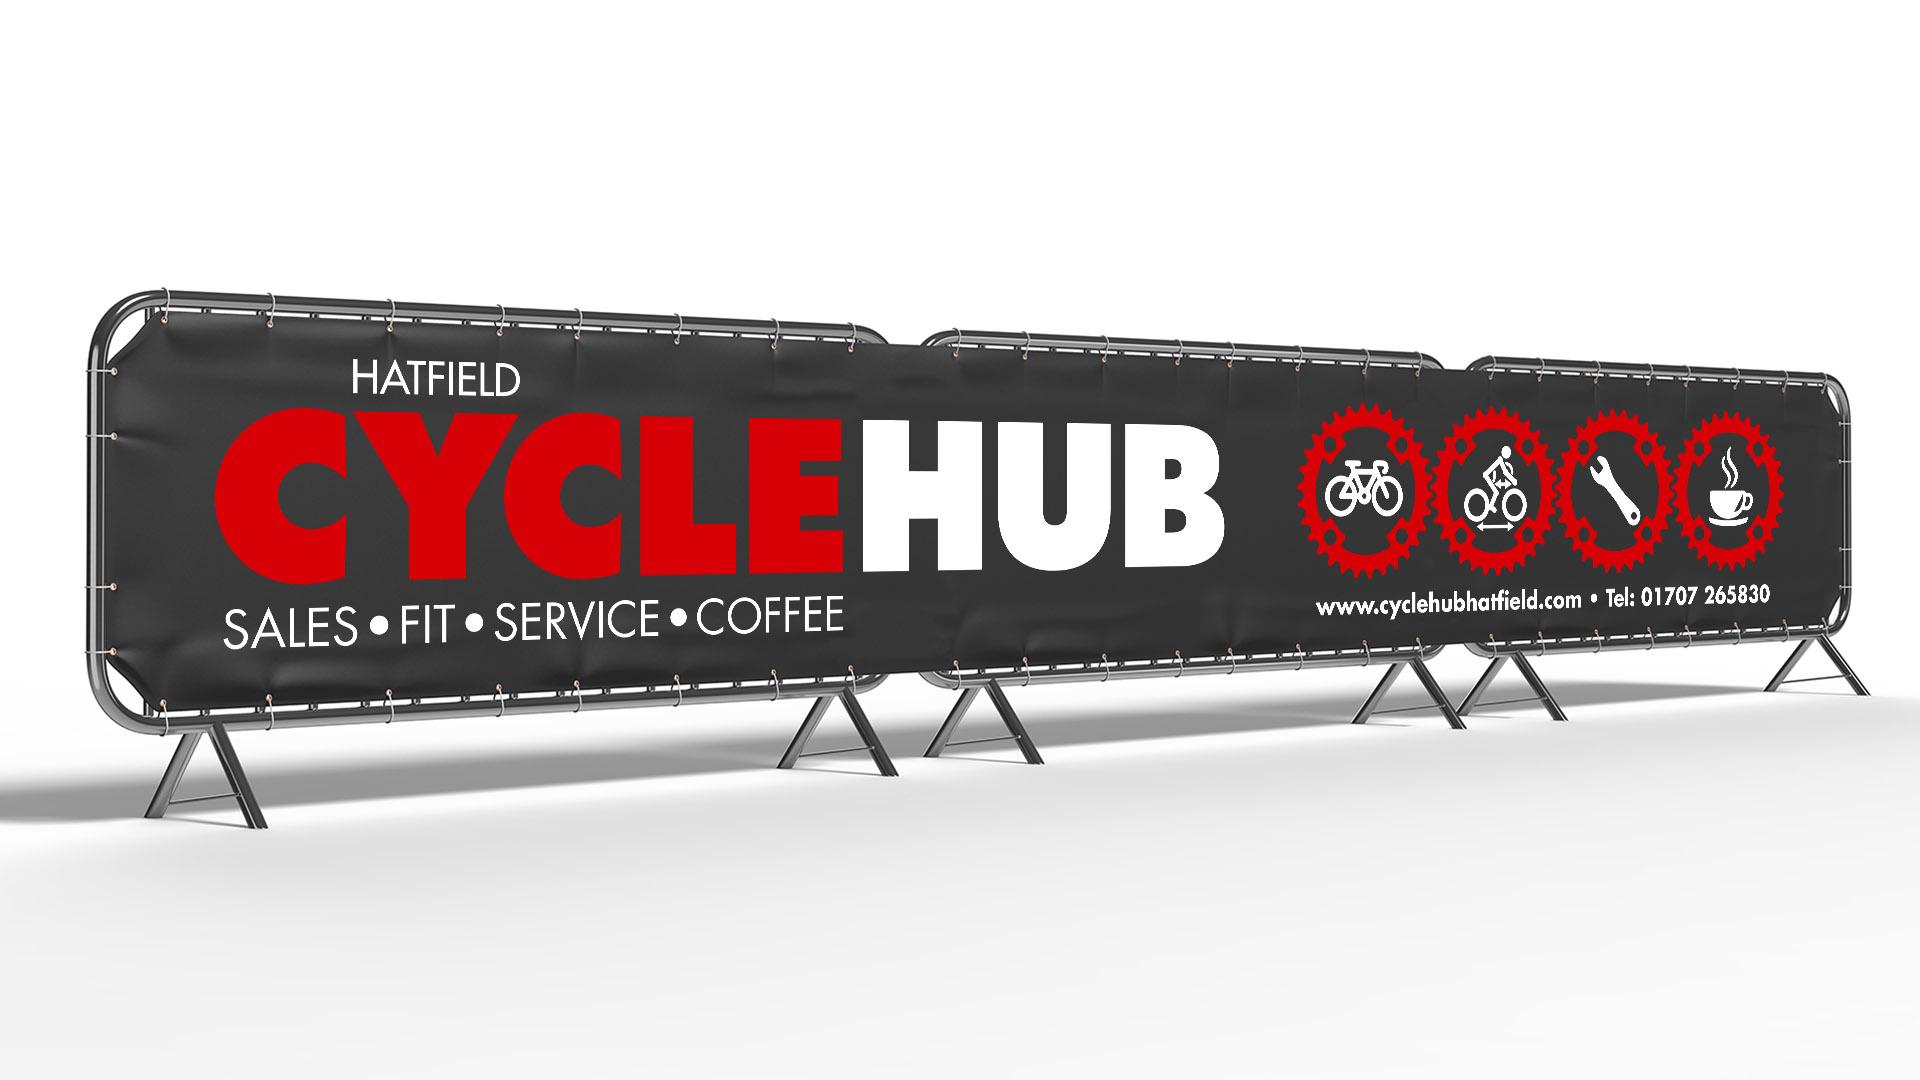 Hatfield Cycle Hub banner